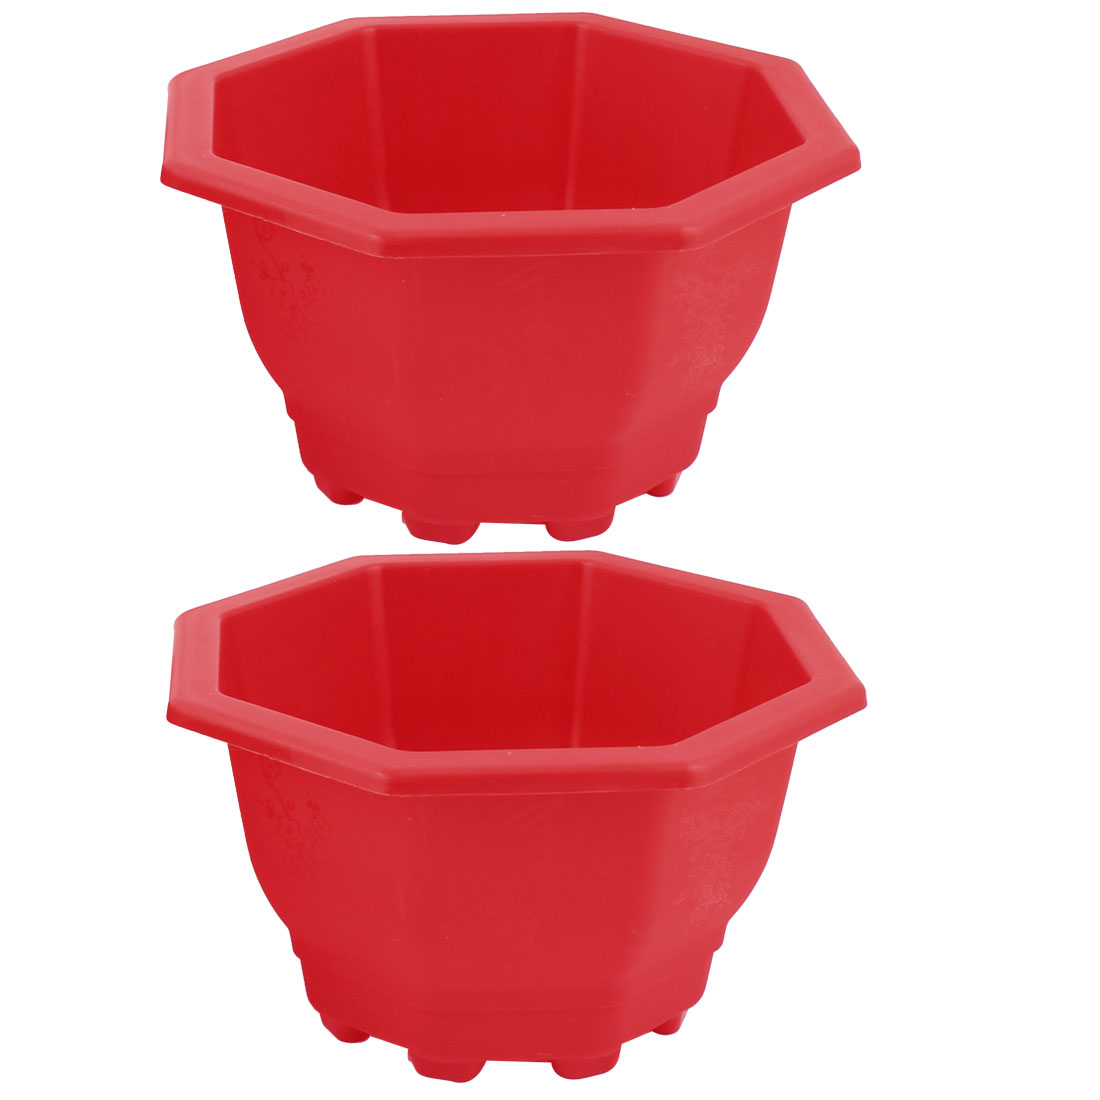 2pcs Blue Red Plastic Octagon Shape Garden Planter Plant Flower Pot Barrels Flowerpot